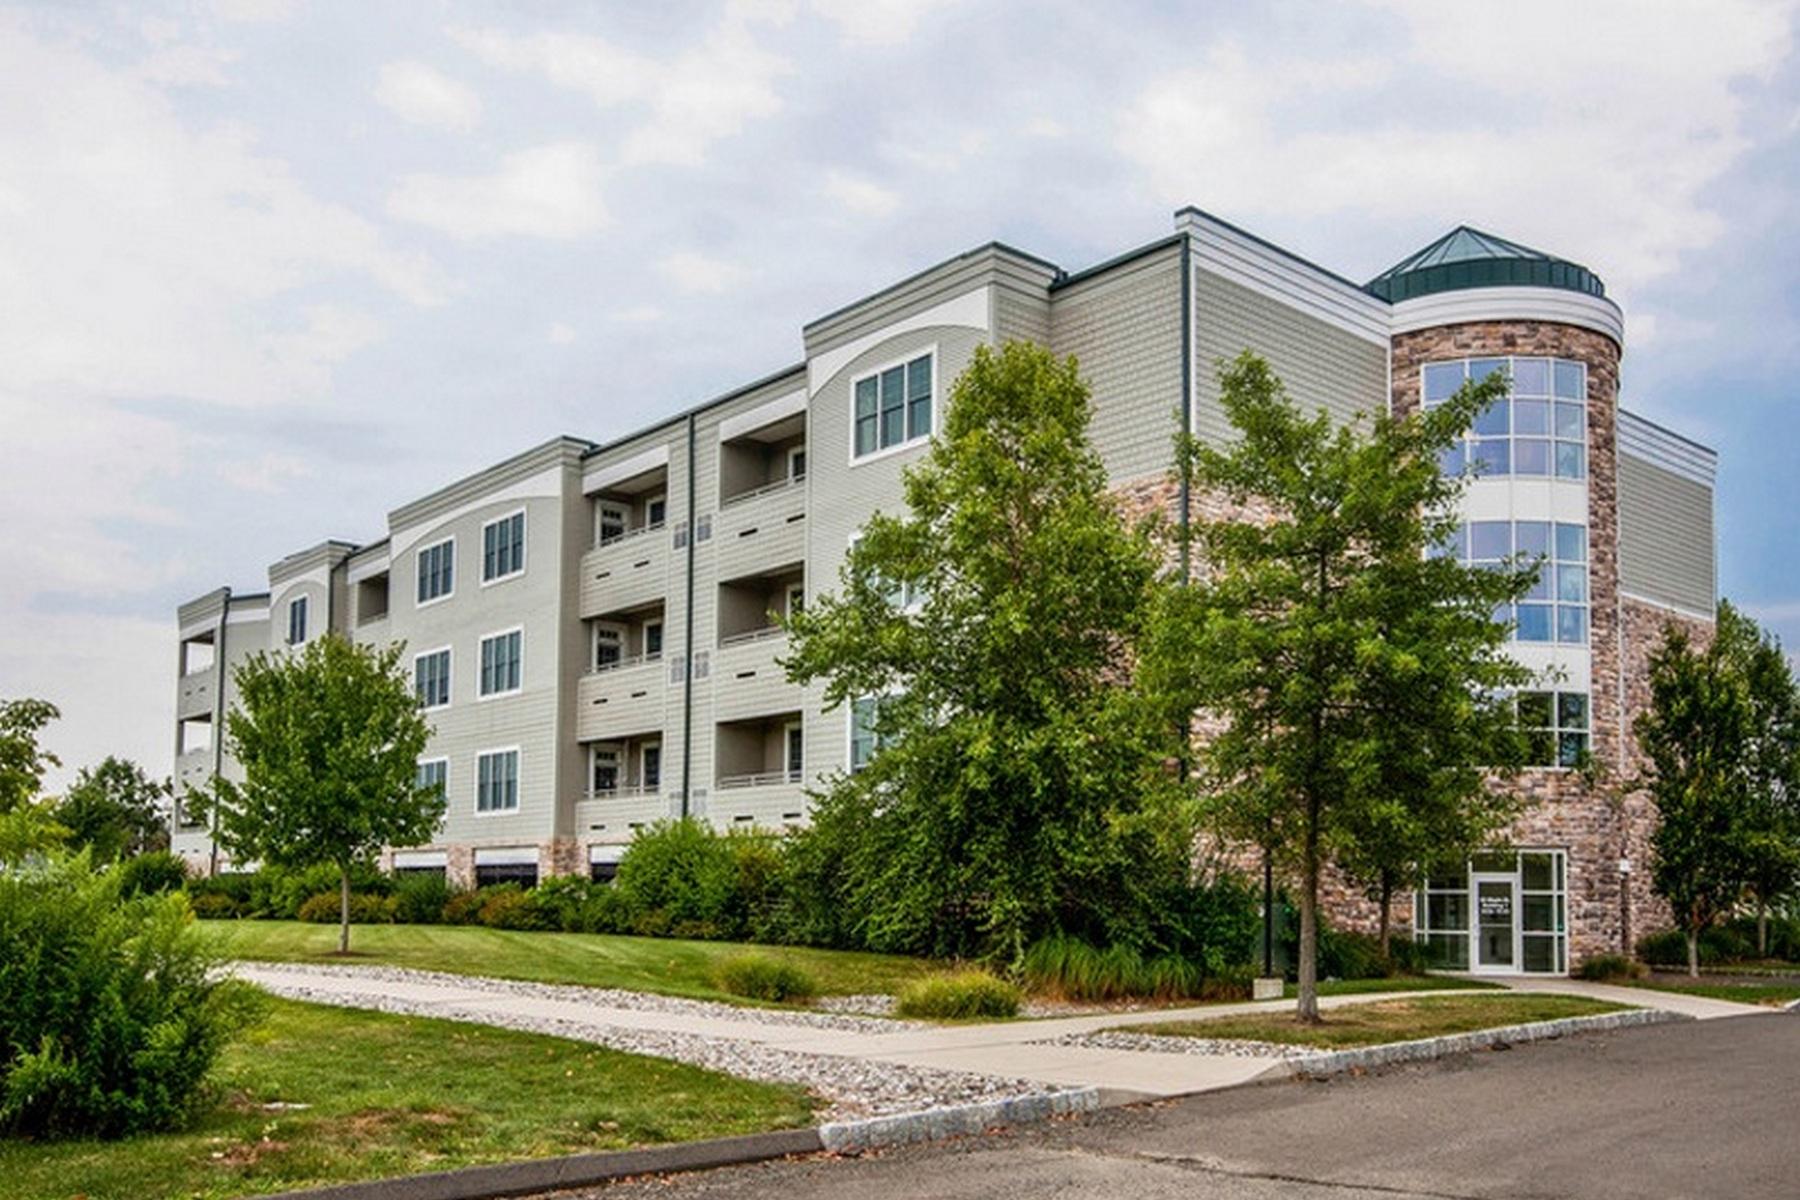 Condominium for Sale at 60 Maple St #38 60 Maple St #38 38 Branford, Connecticut 06405 United States